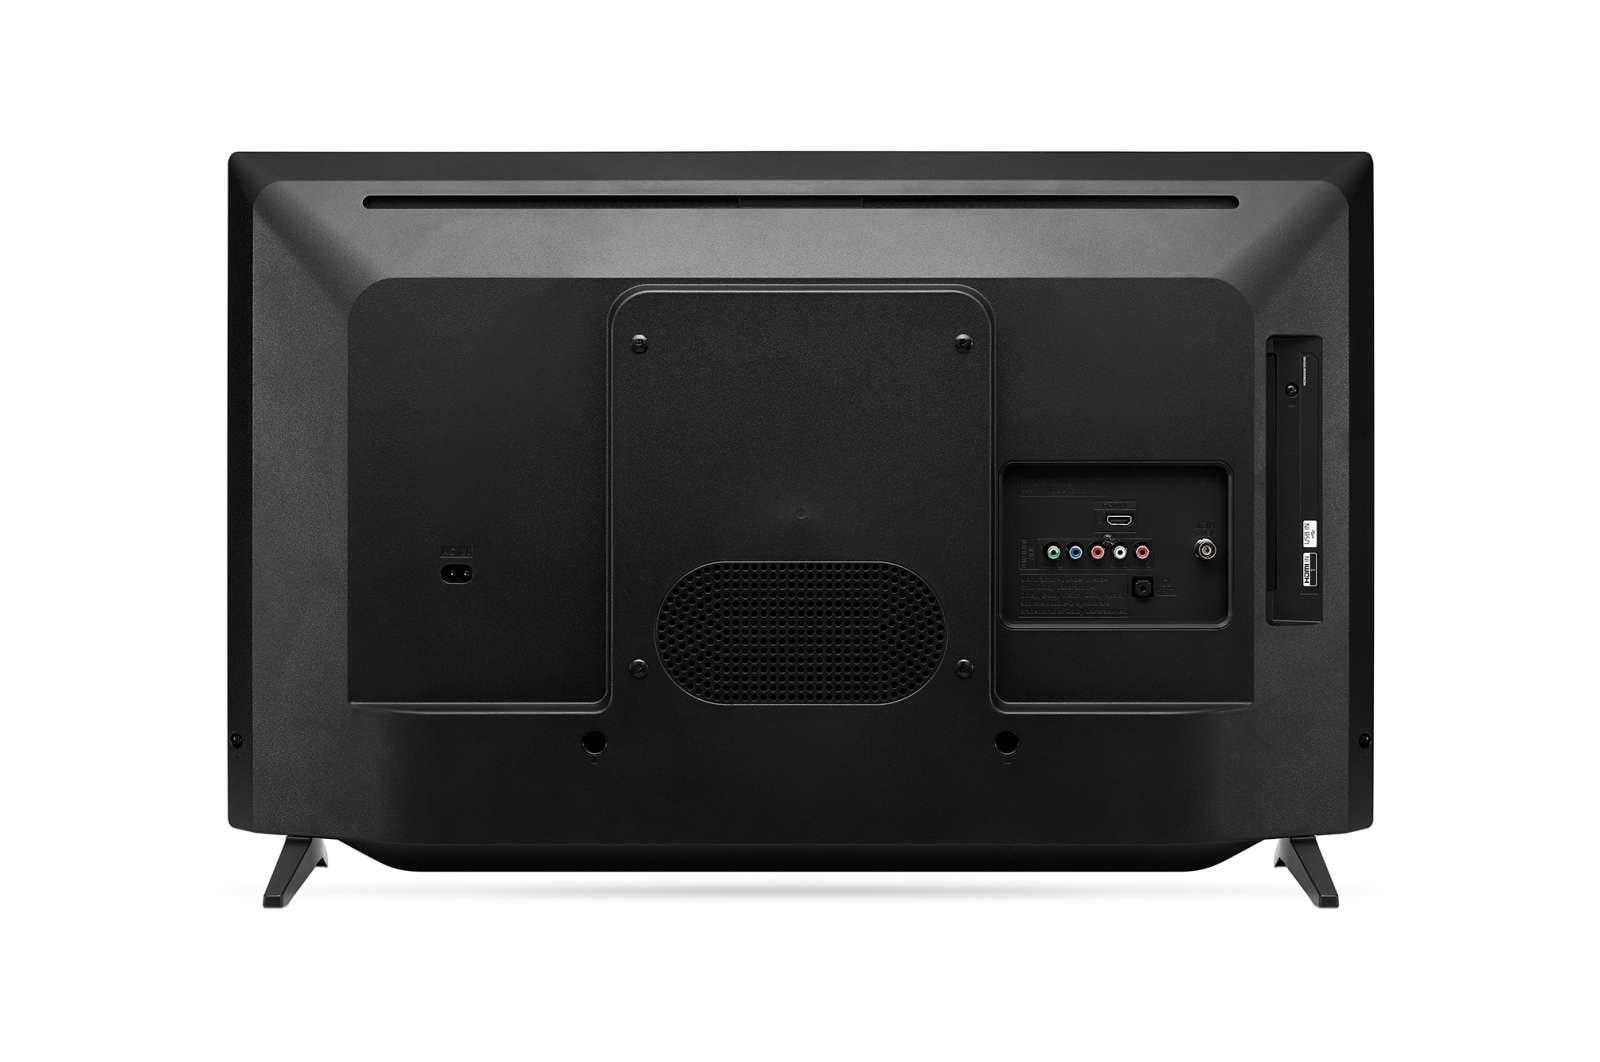 LG 32 Inches HD Ready LED Smart TV (32LK628BPTF)